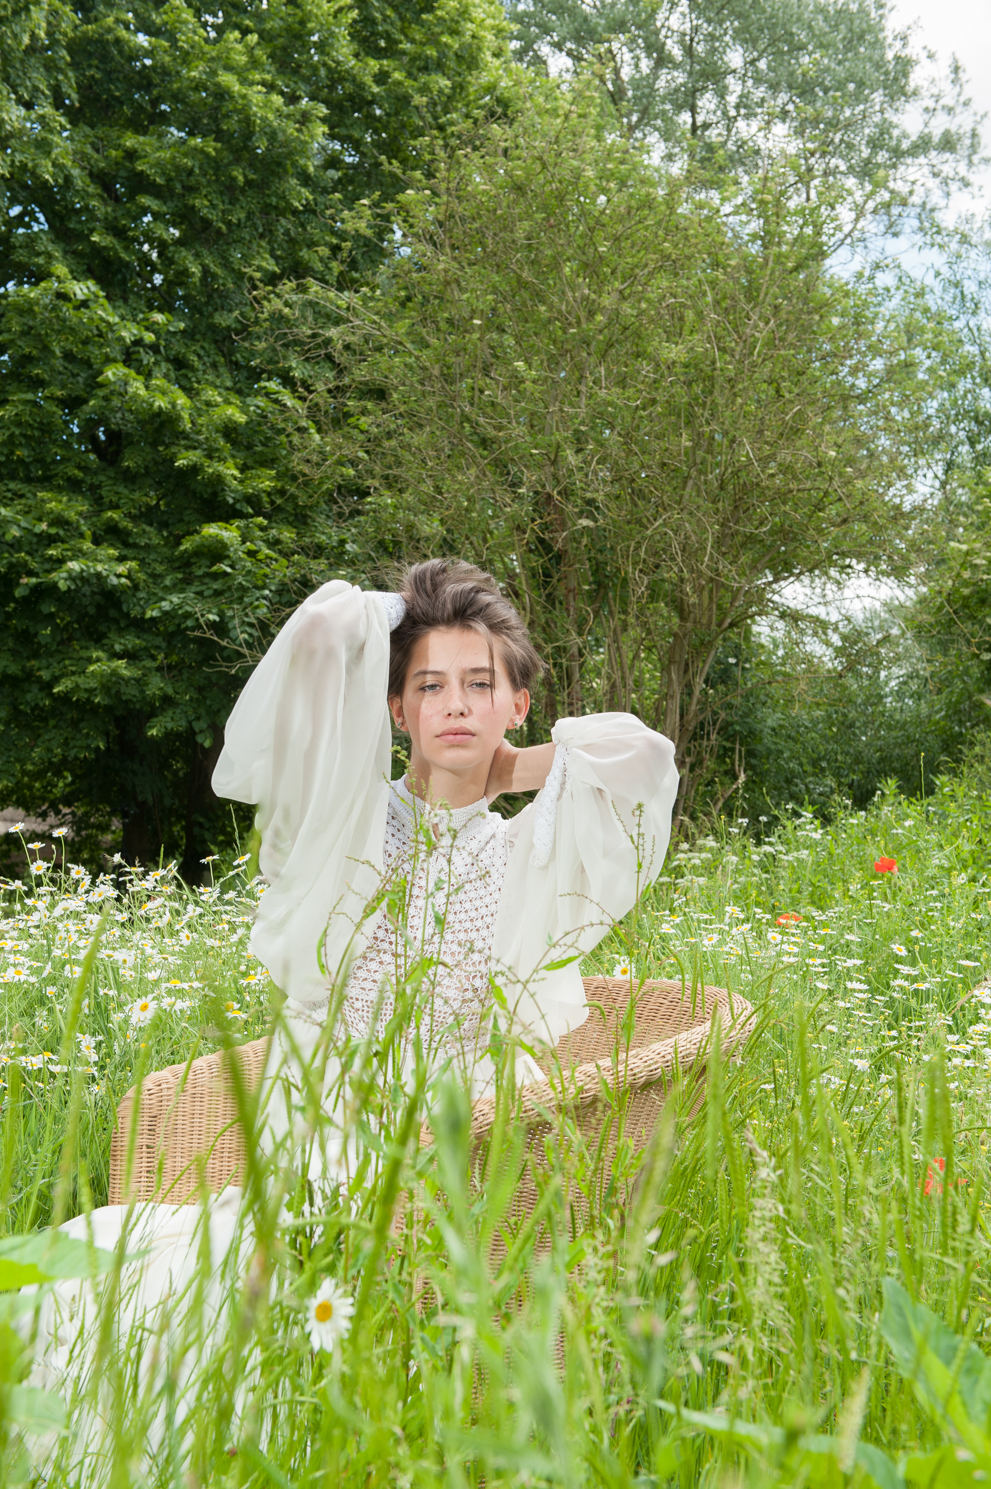 Spring days. Fashion portrait by Farnham, Surrey based portrait photographer James Muller